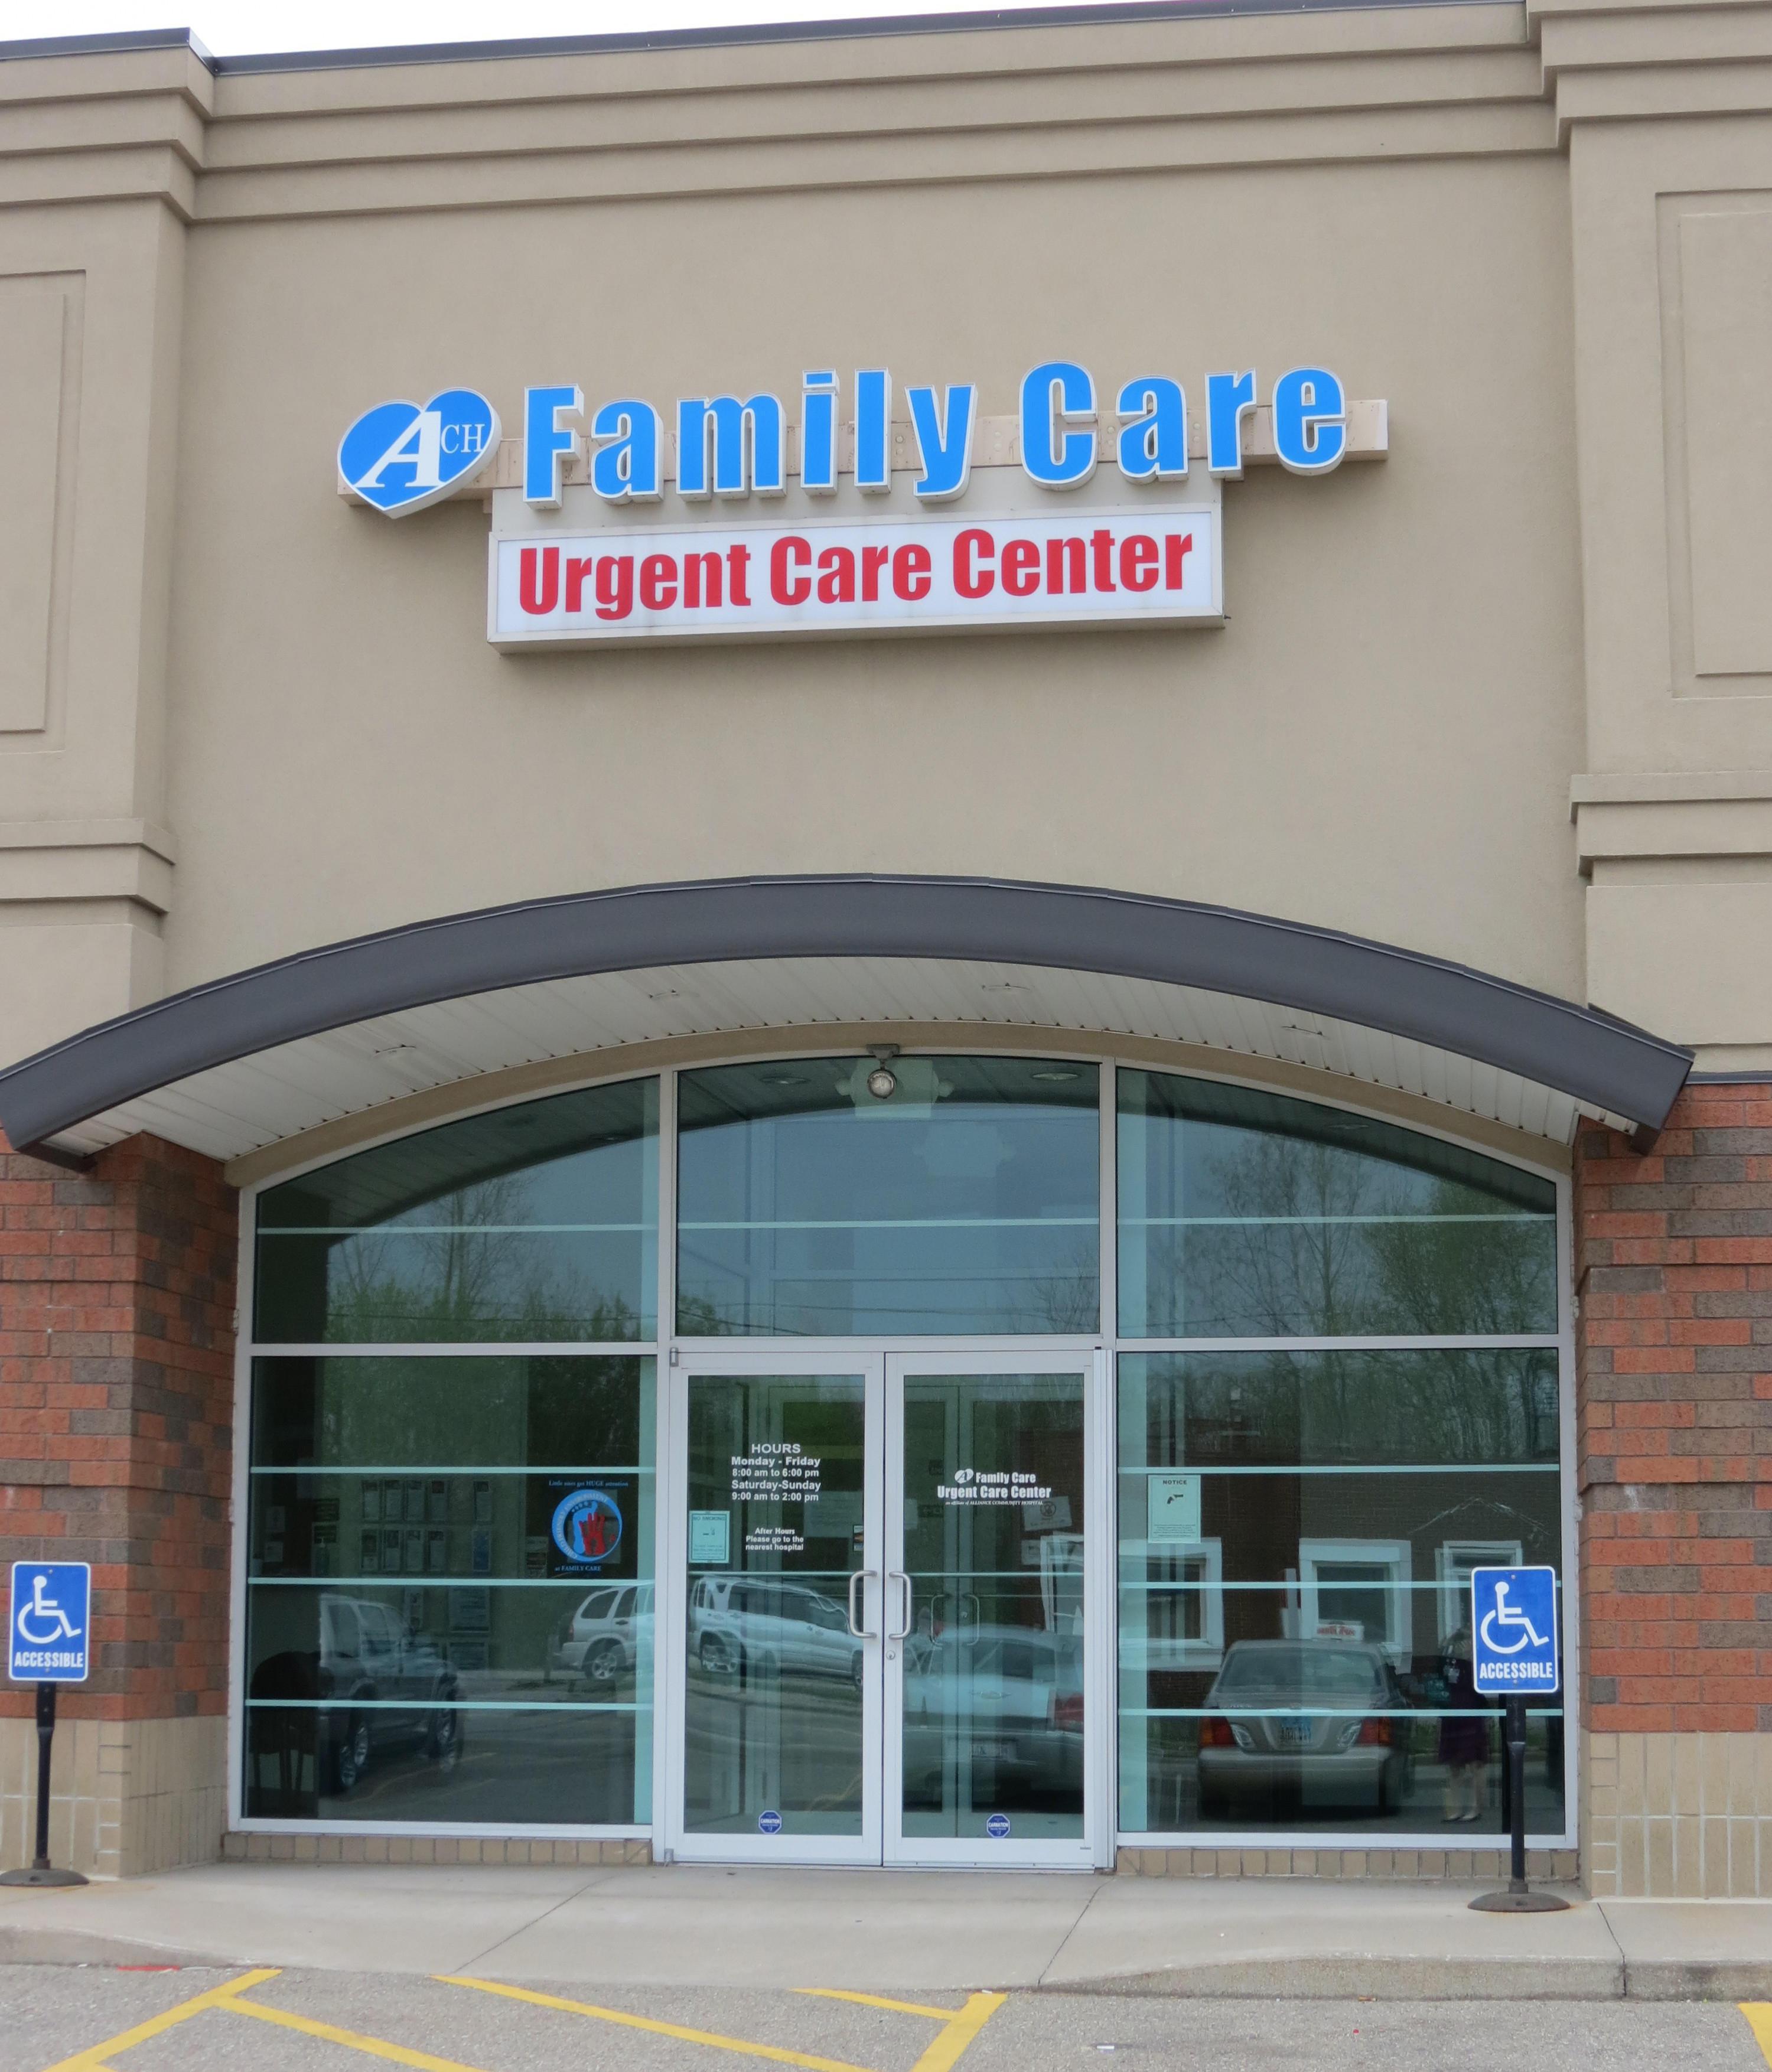 ACH Family Care Urgent Care Center image 0